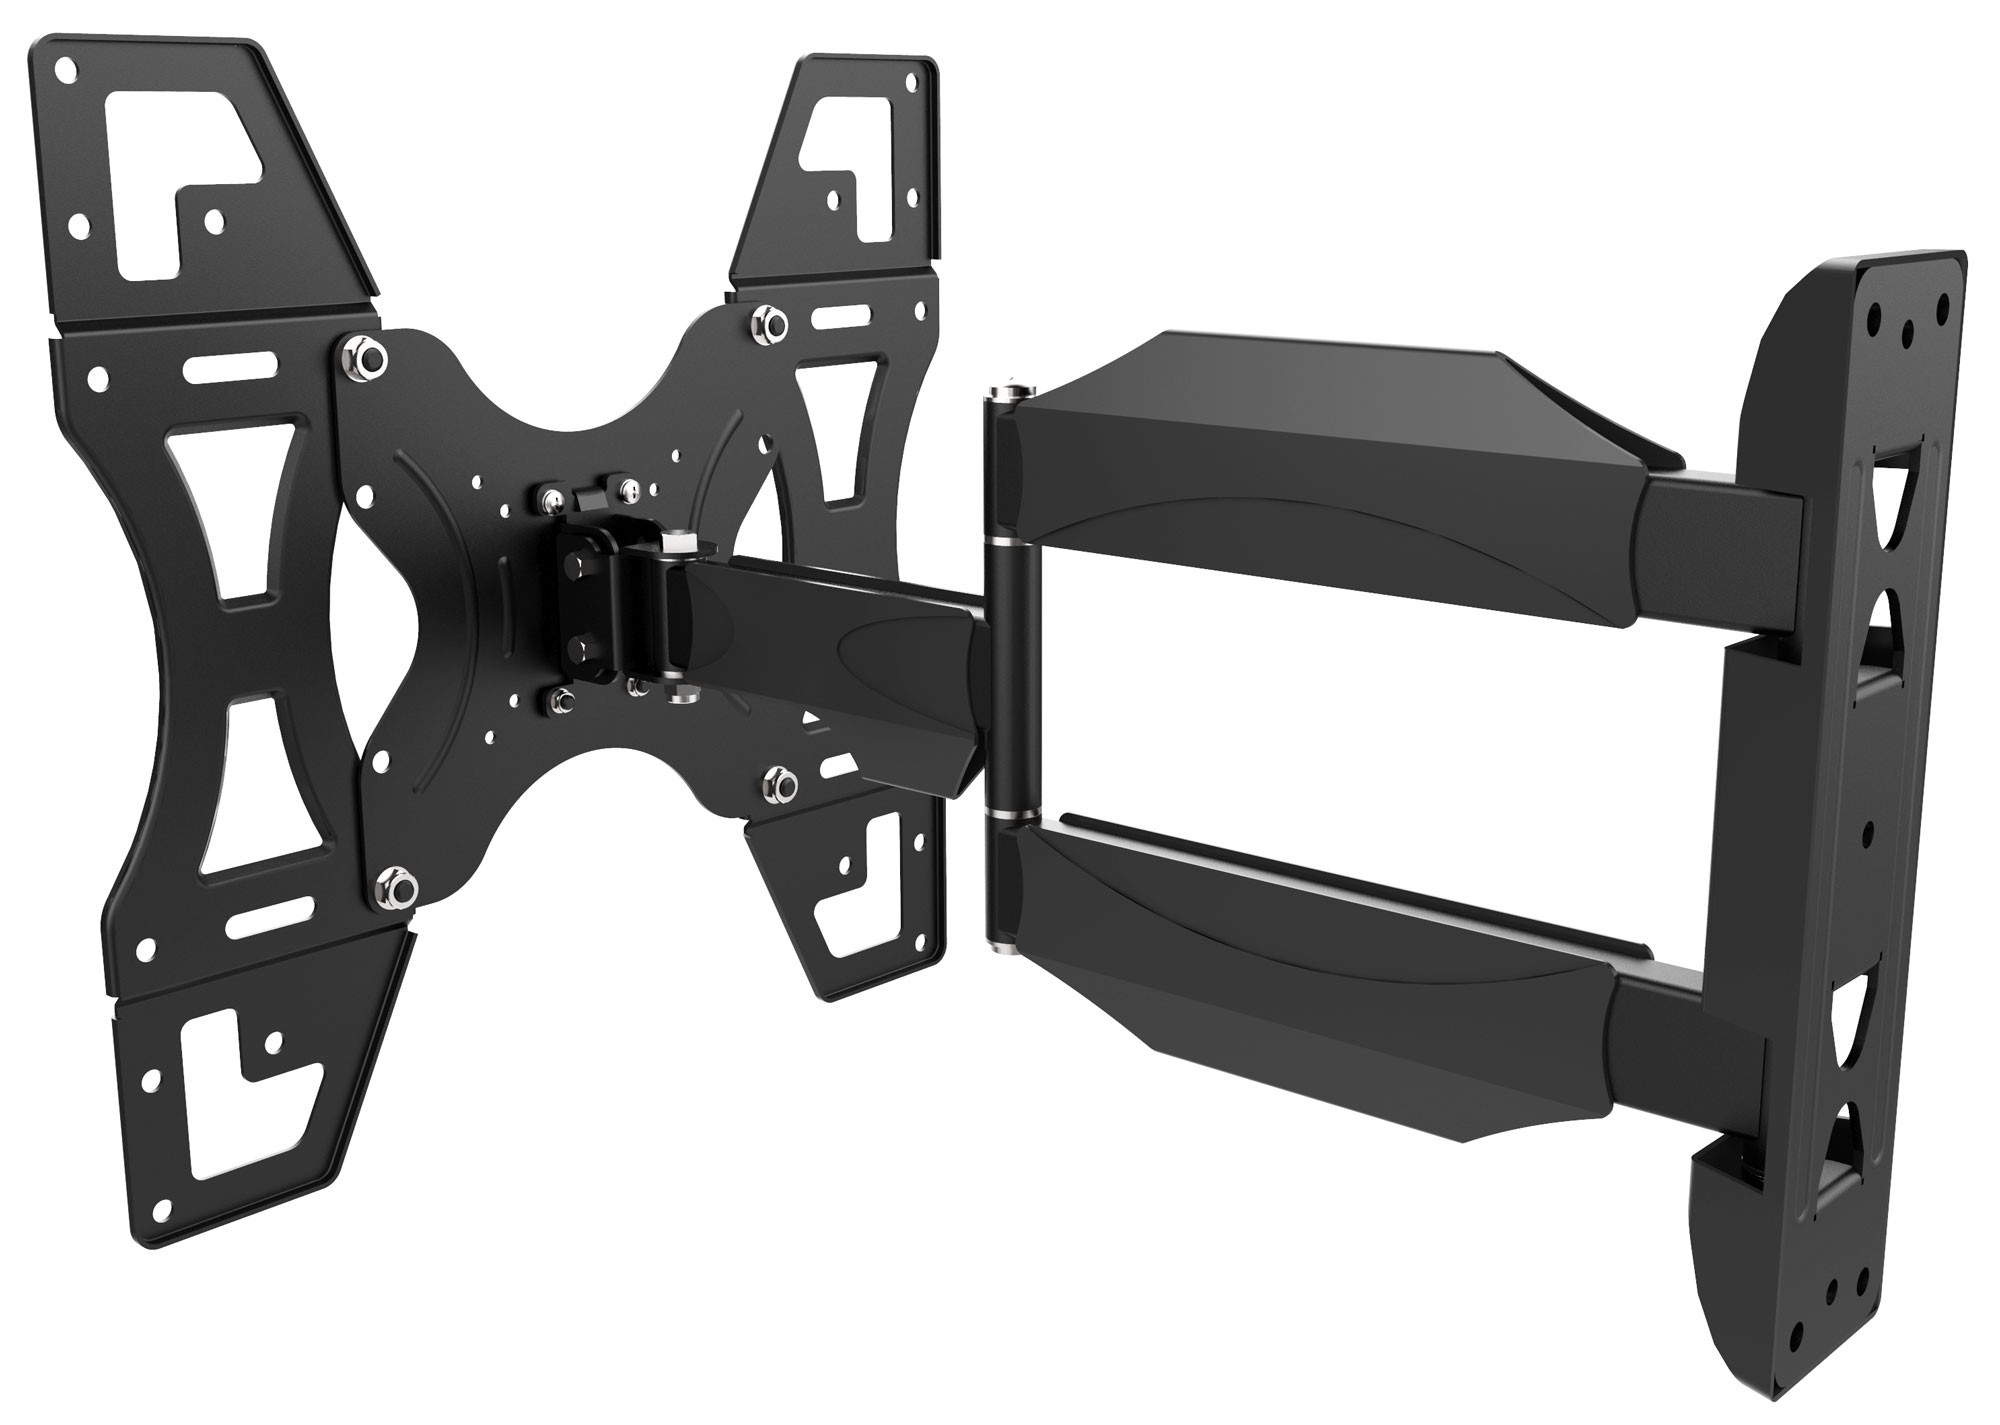 wandhalterung tv schwenkbar neigbar s0244 universal lcd. Black Bedroom Furniture Sets. Home Design Ideas